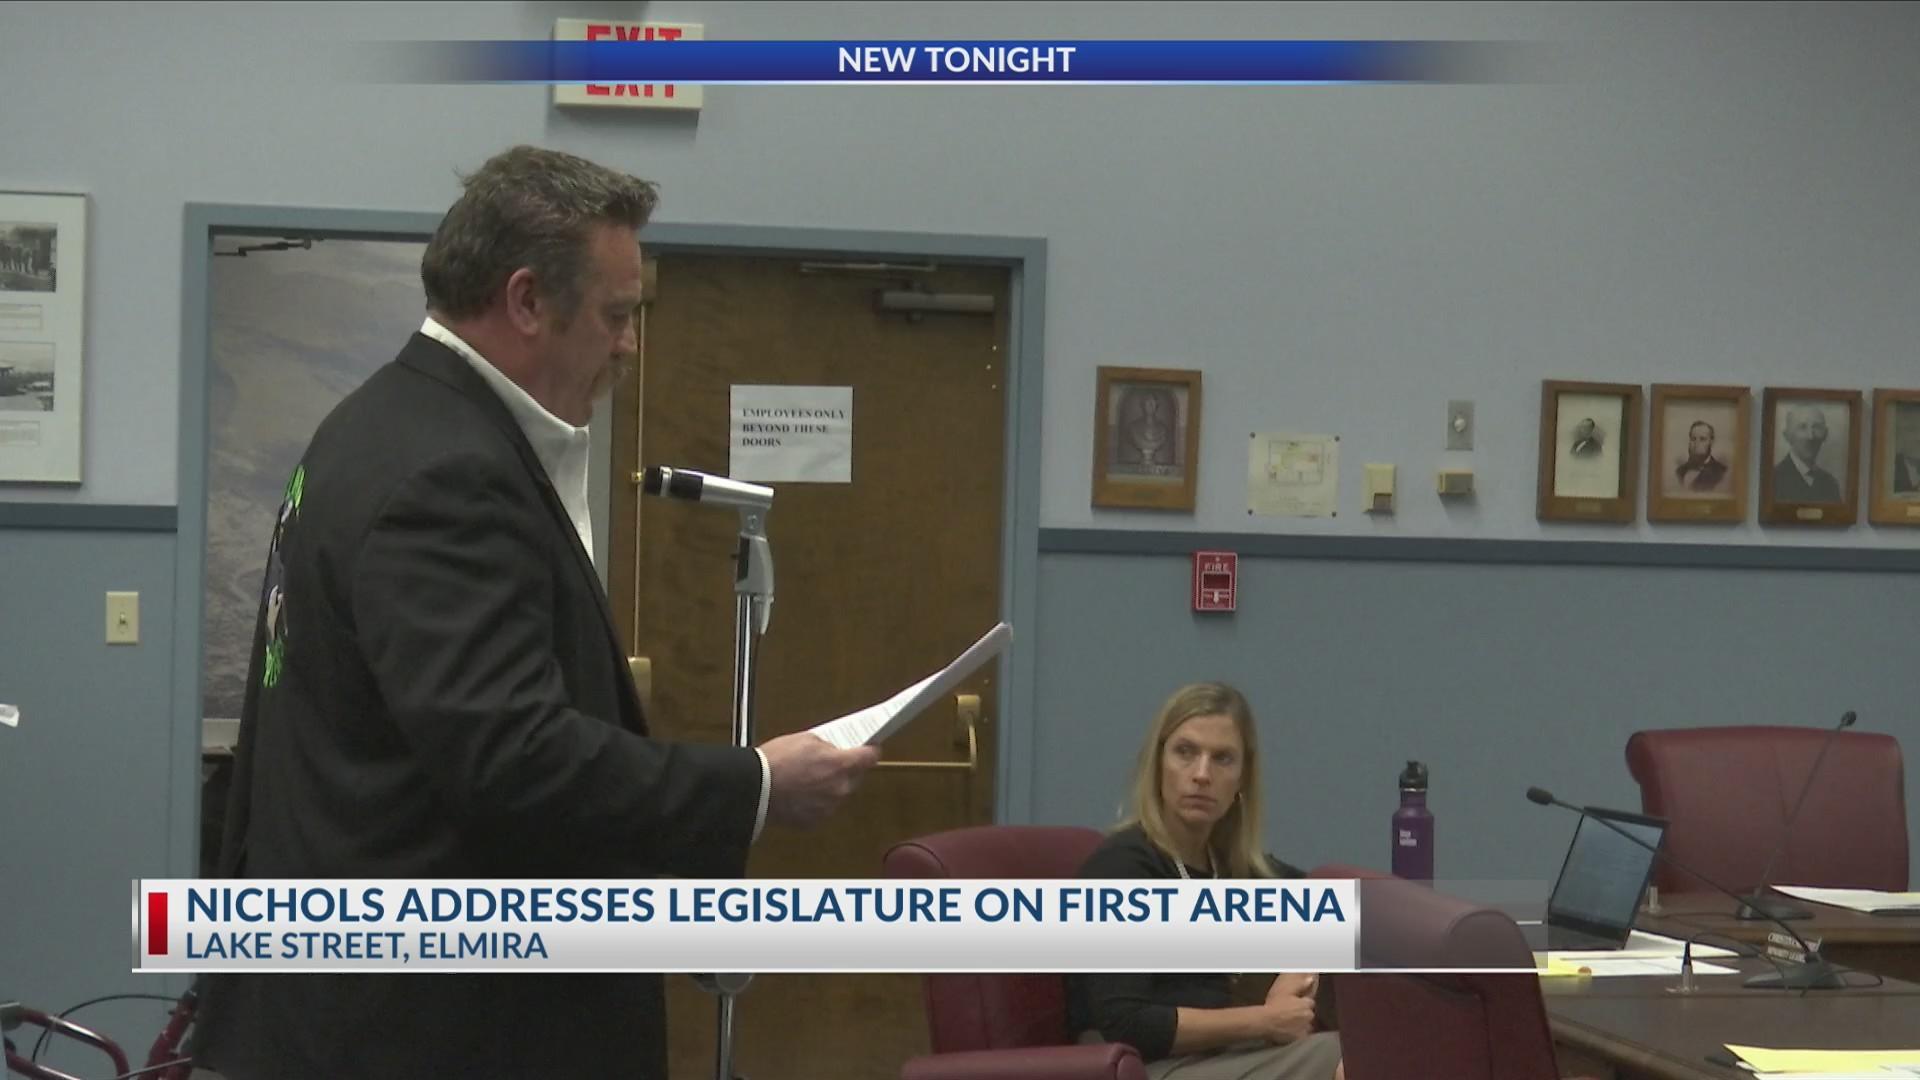 Nichols Addresses Legislature on First Arena